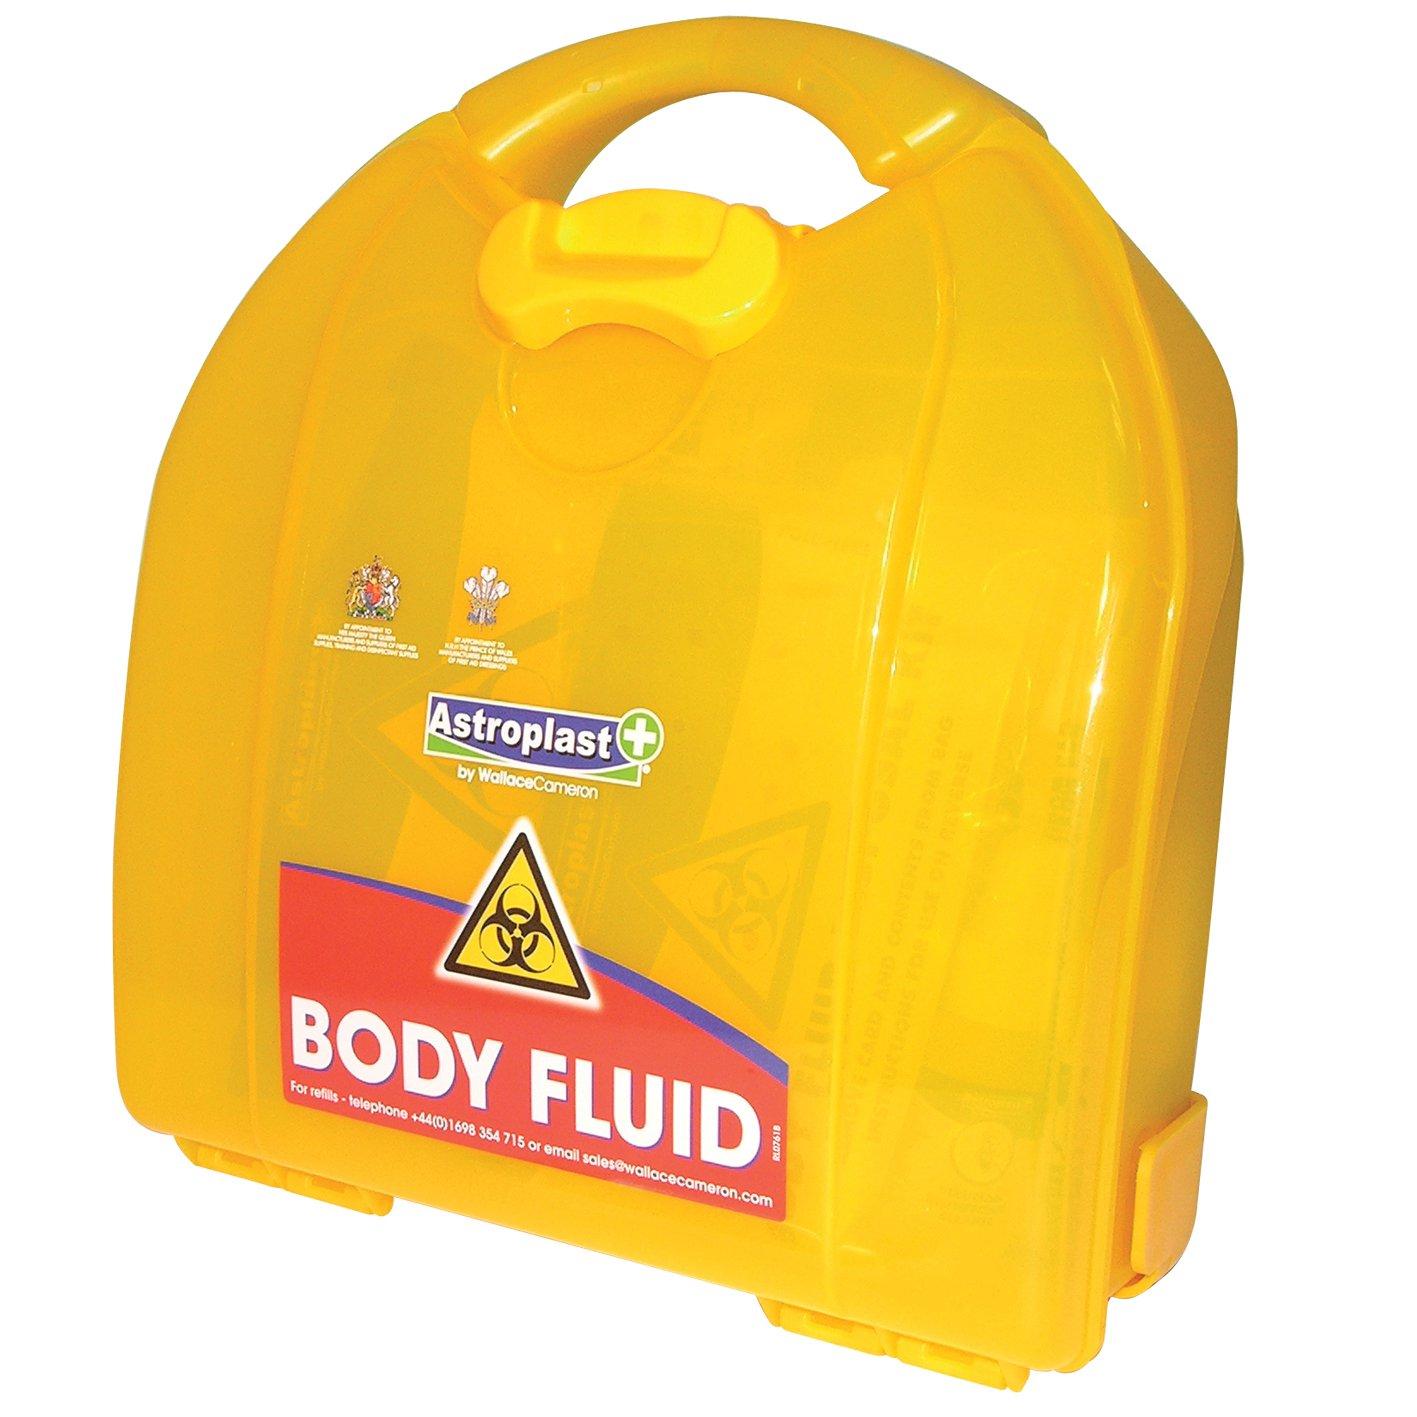 Astroplast Mezzo Body Fluid Dispenser 4 Application Wallace Cameron 1047160